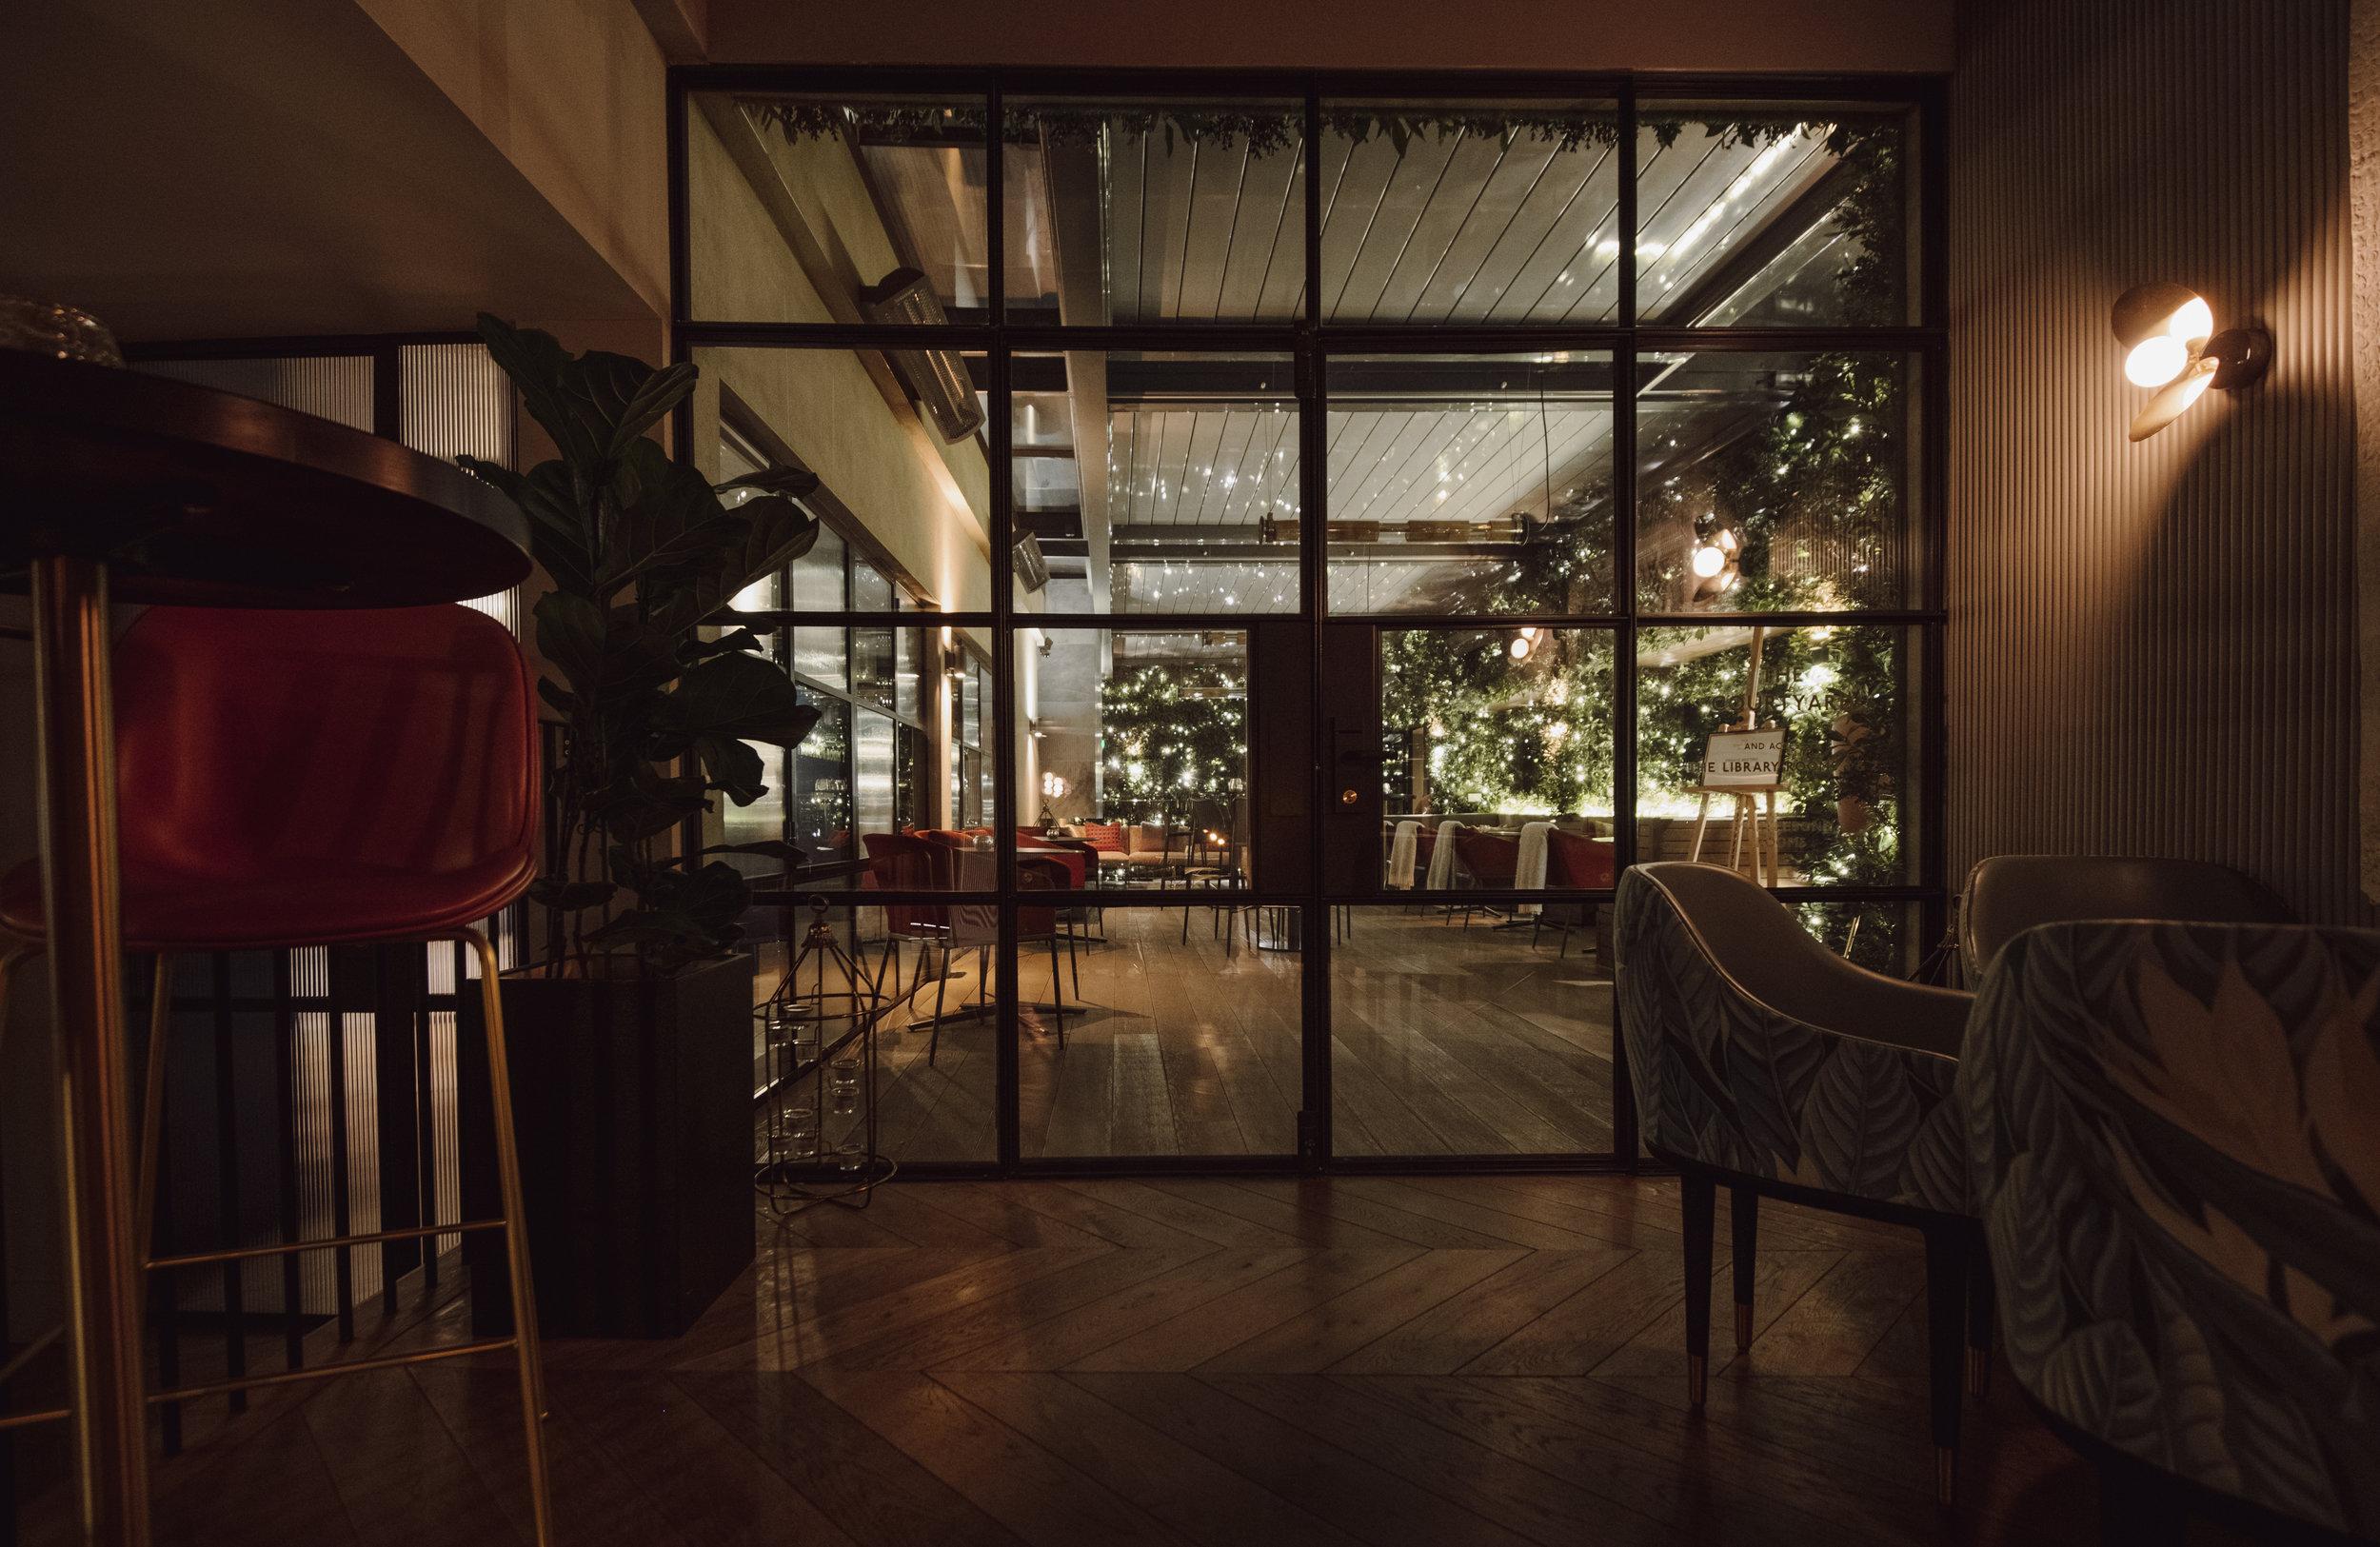 Hotel Marylebone | Nicole Bissey Photography 07.JPG